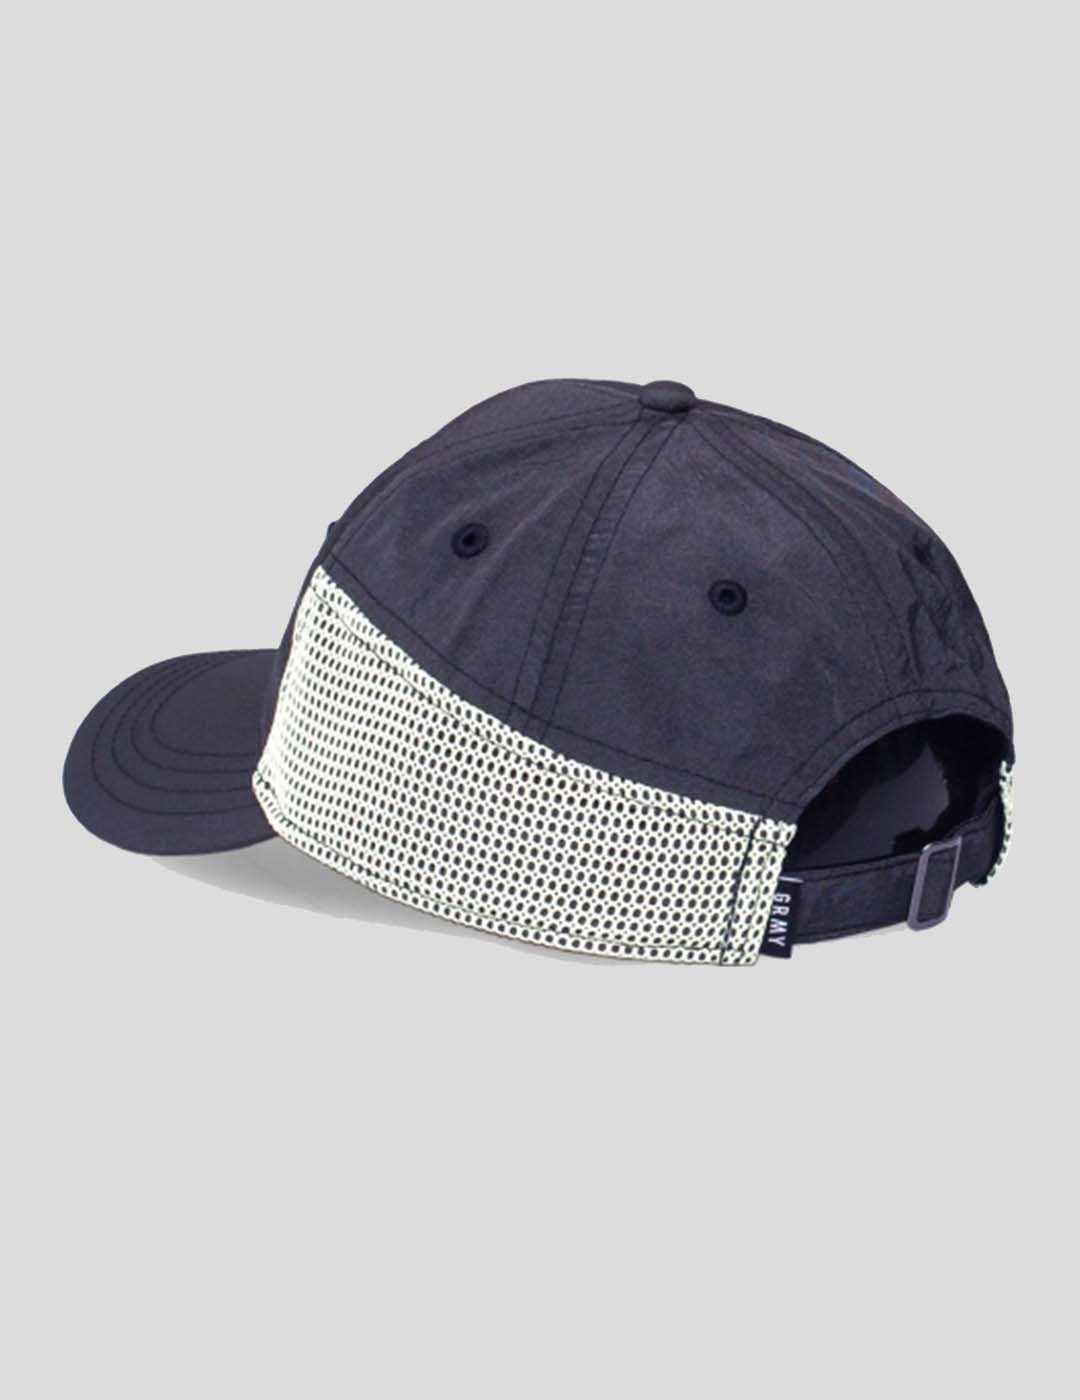 GORRA GRIMEY STEEZ CURVED VISOR CAP BLACK